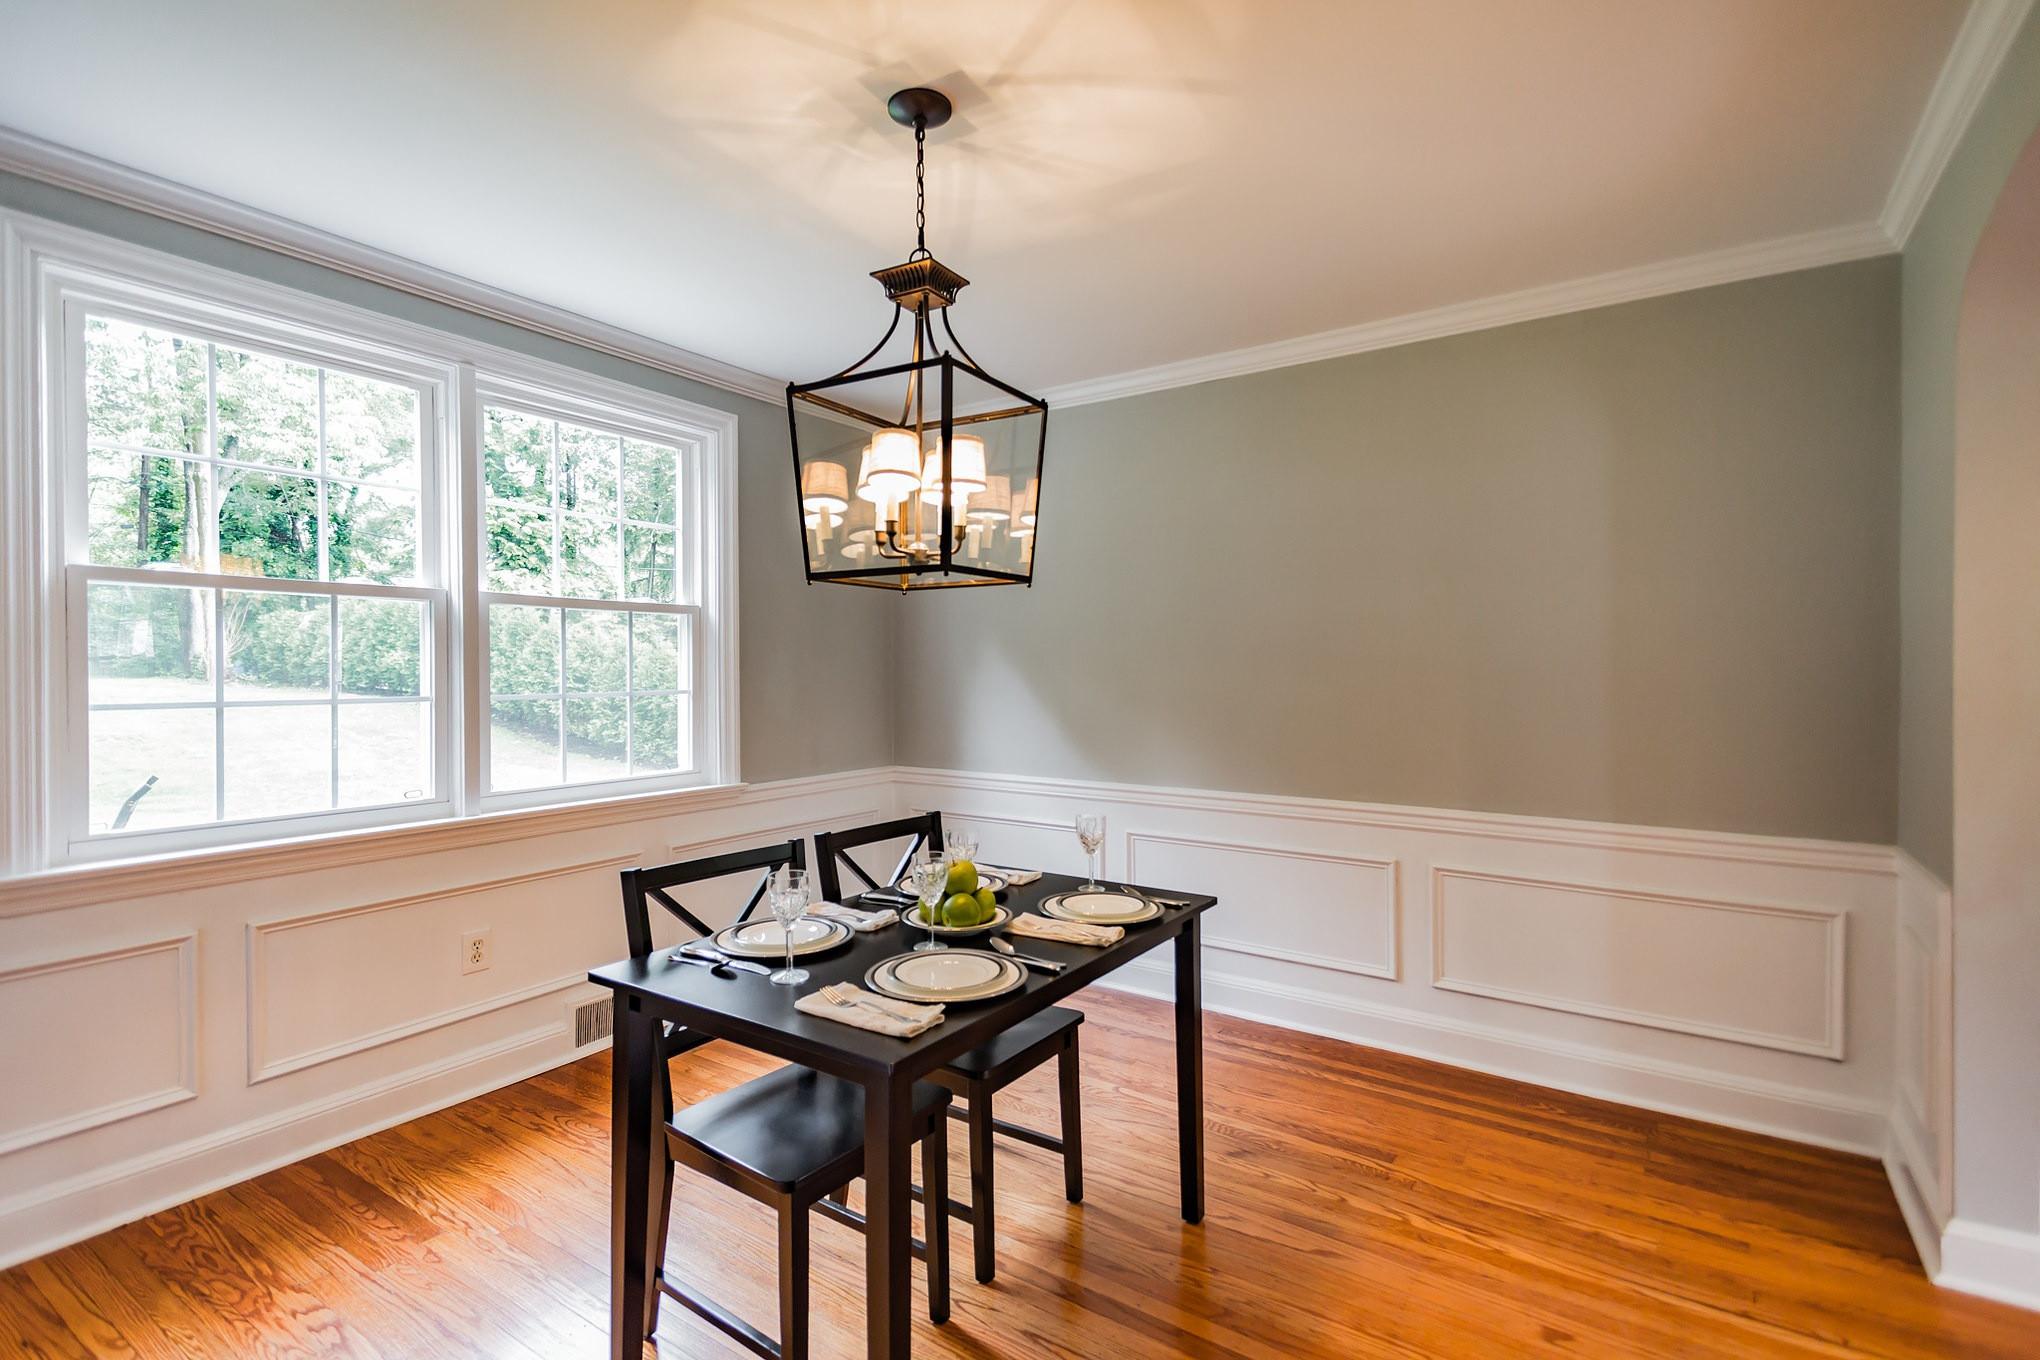 yd hardwood floors usa inc philadelphia pa of 208 w hathaway ln ardmore pa 19003 houwzer intended for 208 hathaway 8